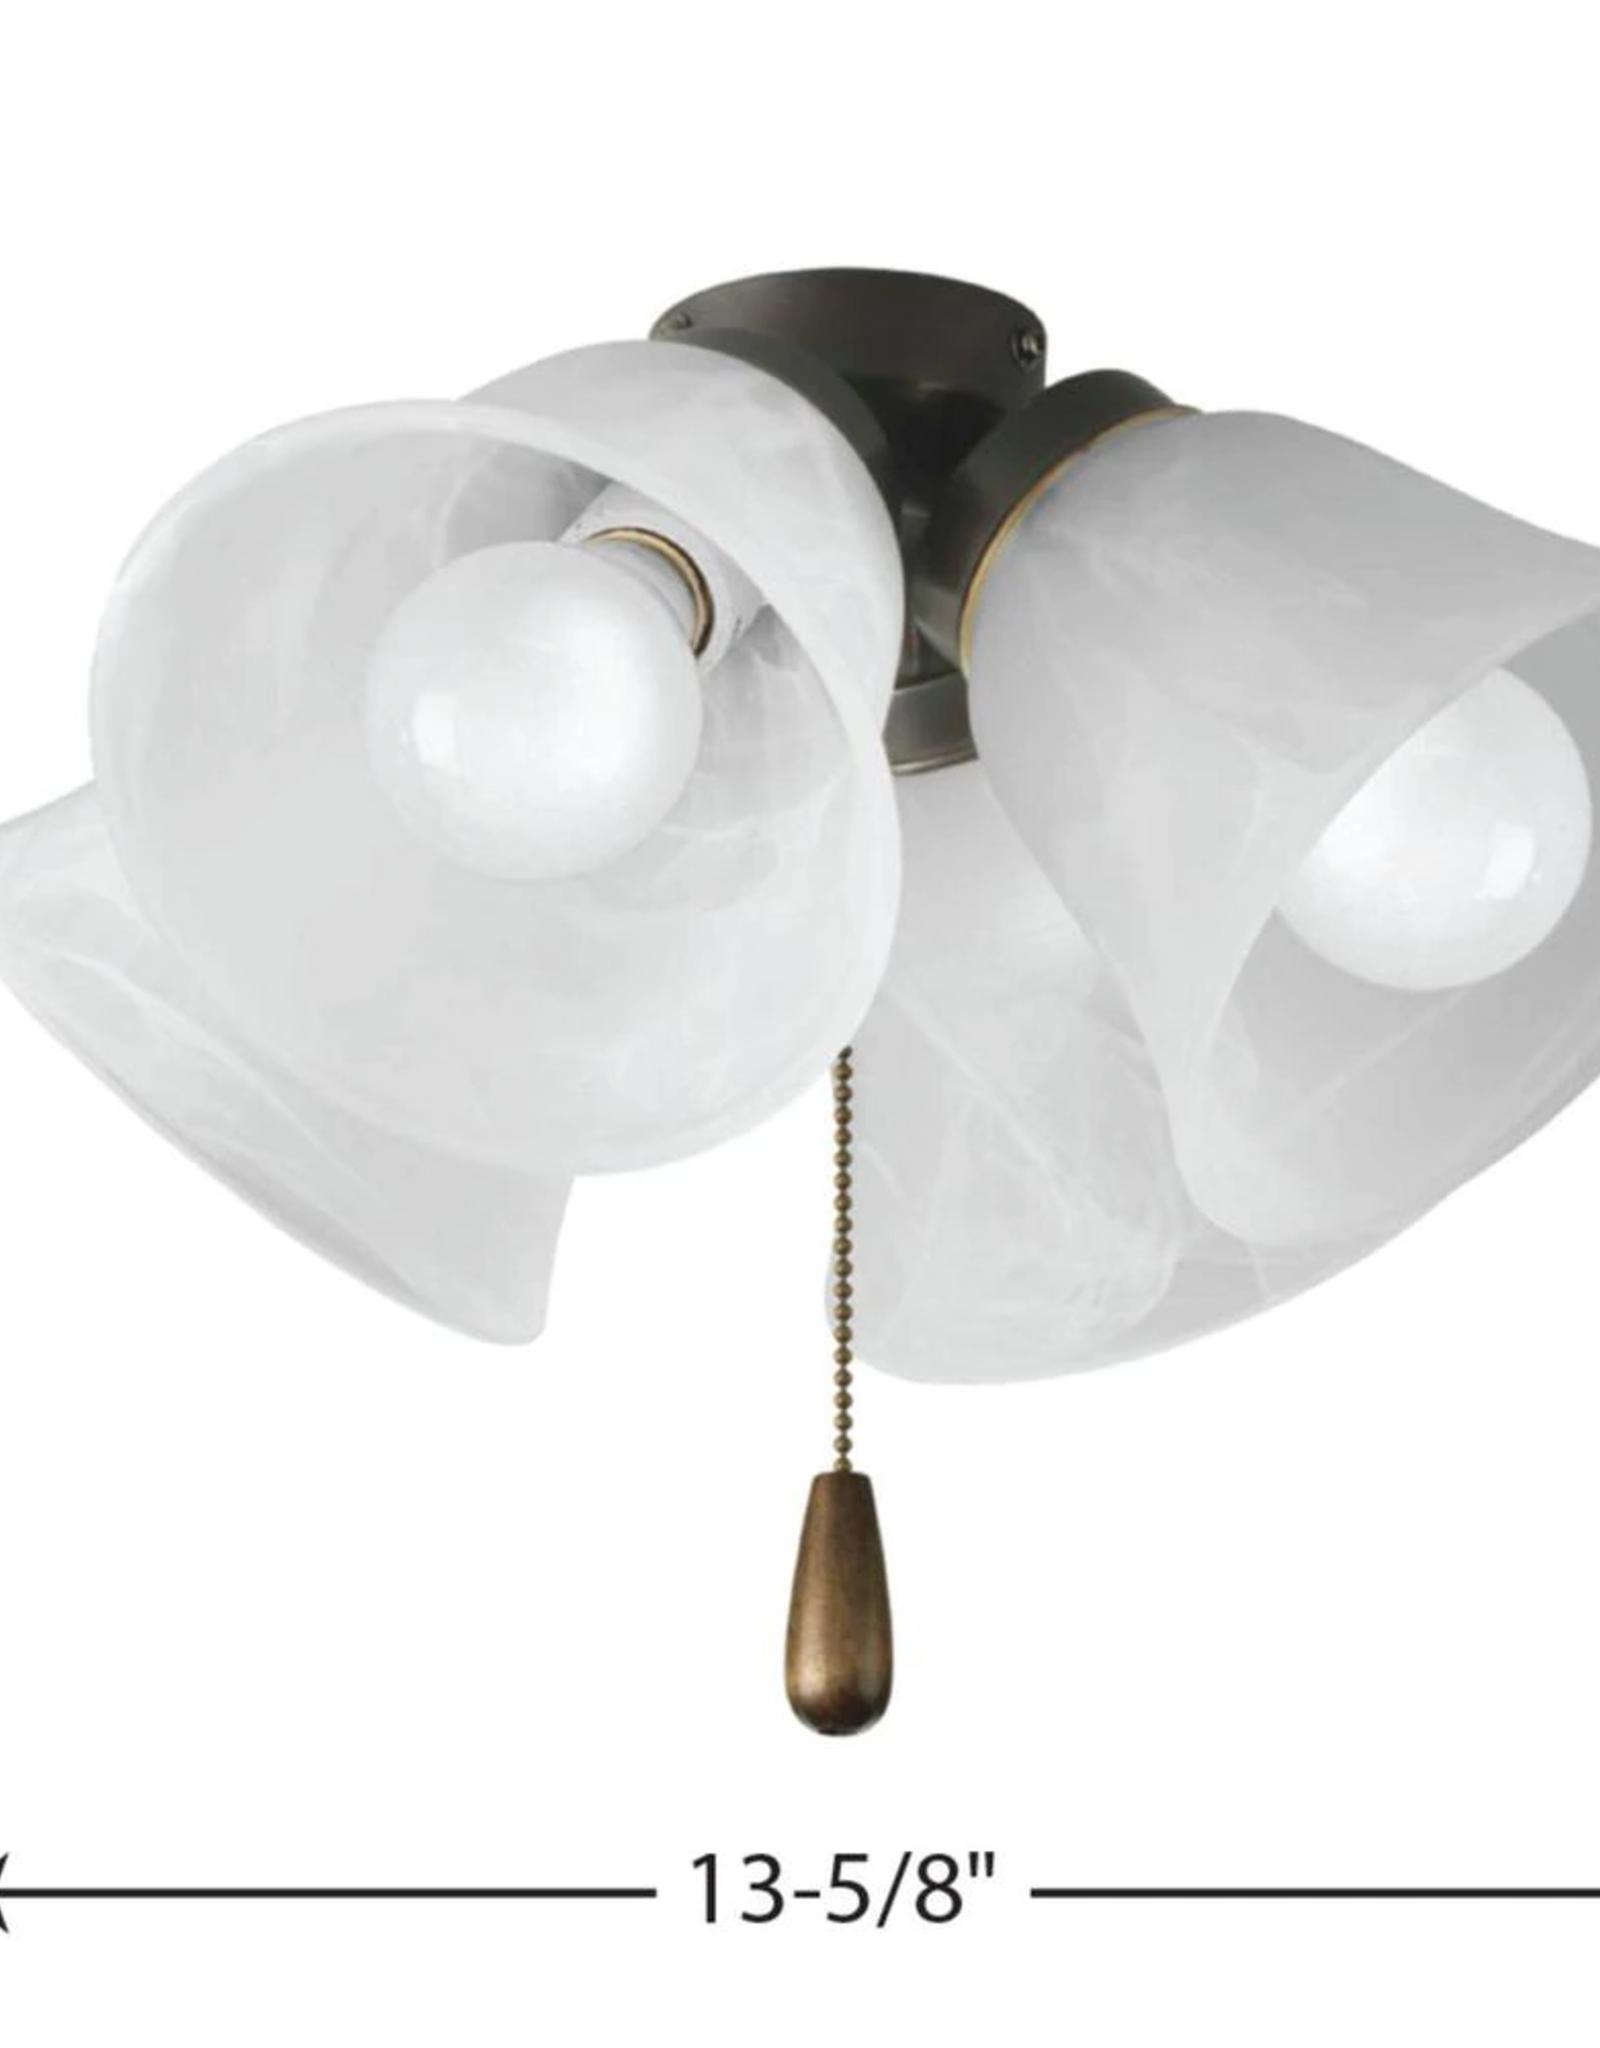 Progress Lighting Fan Light Kits Collection 4-Light Antique Bronze Ceiling Fan Light Kit